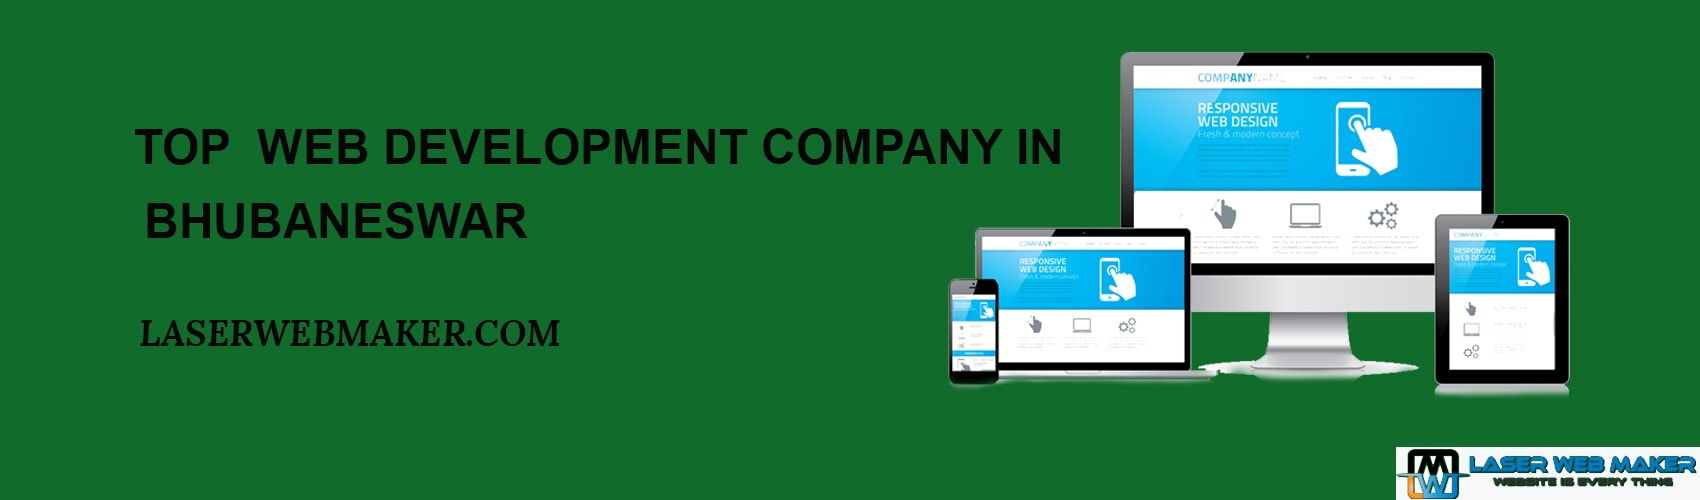 Top Web Development Company In Bhubaneswar